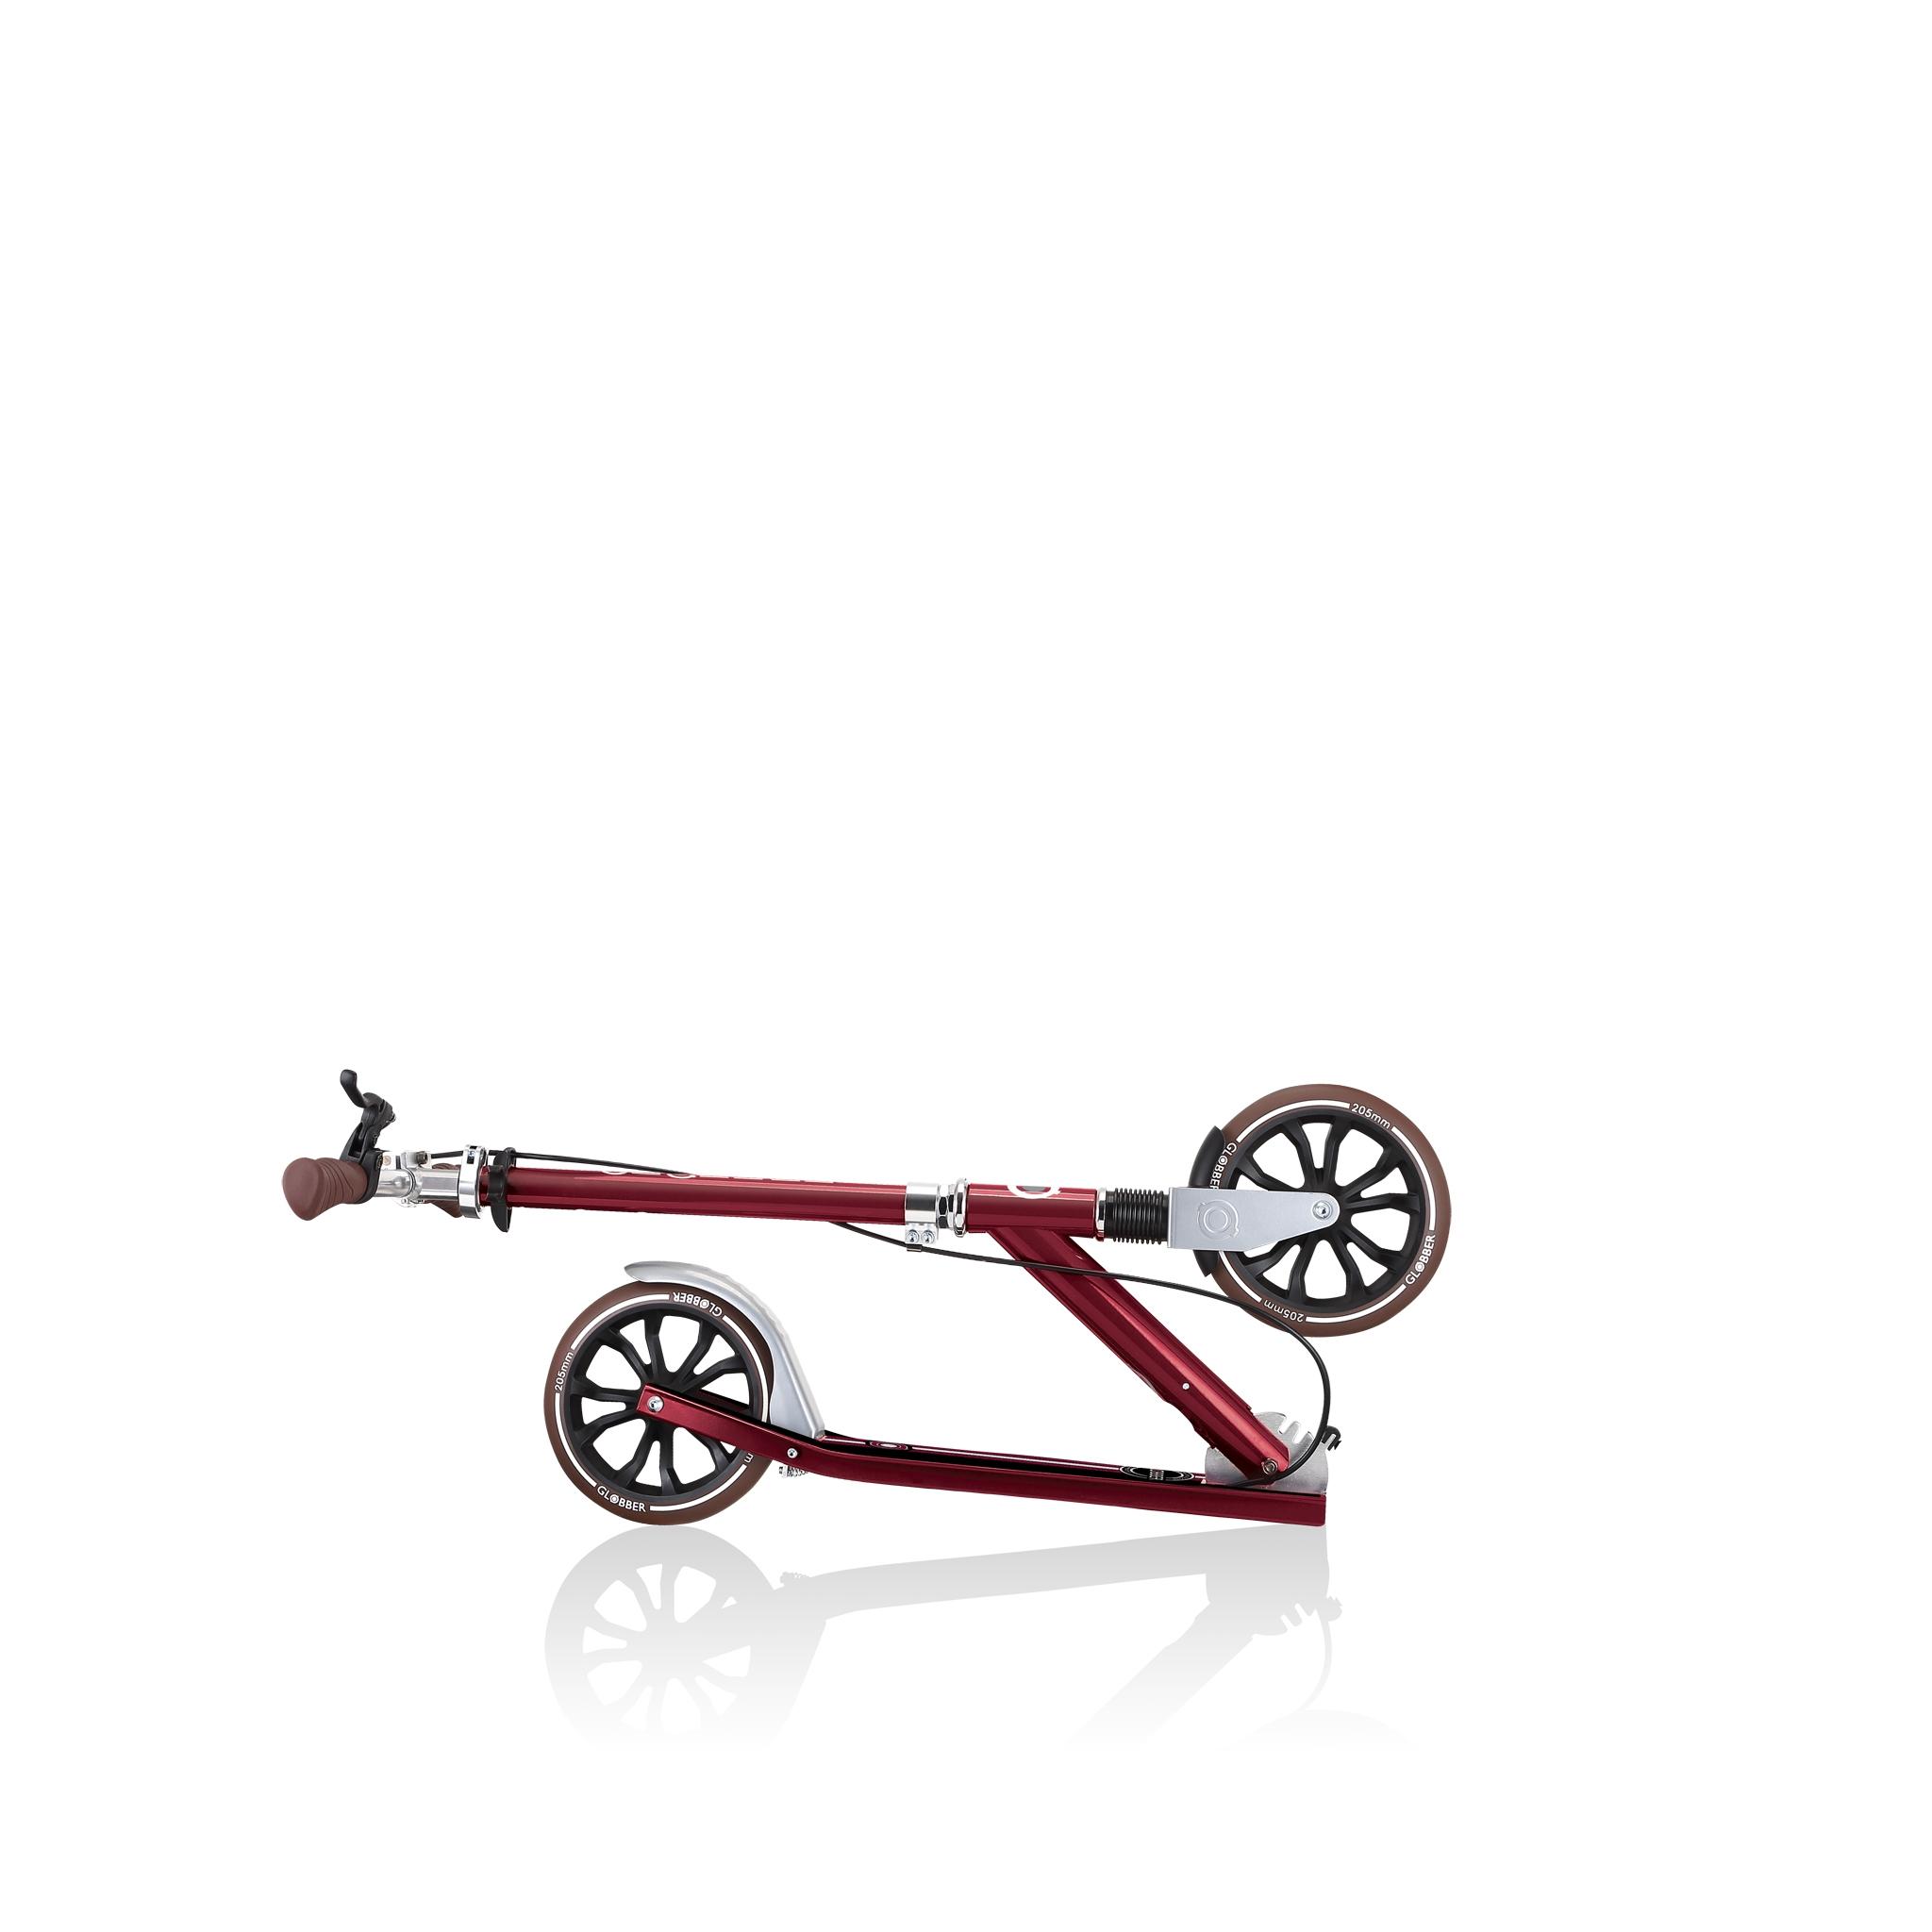 Globber-NL-205-DELUXE-foldable-big-wheel-scooter-for-kids 1